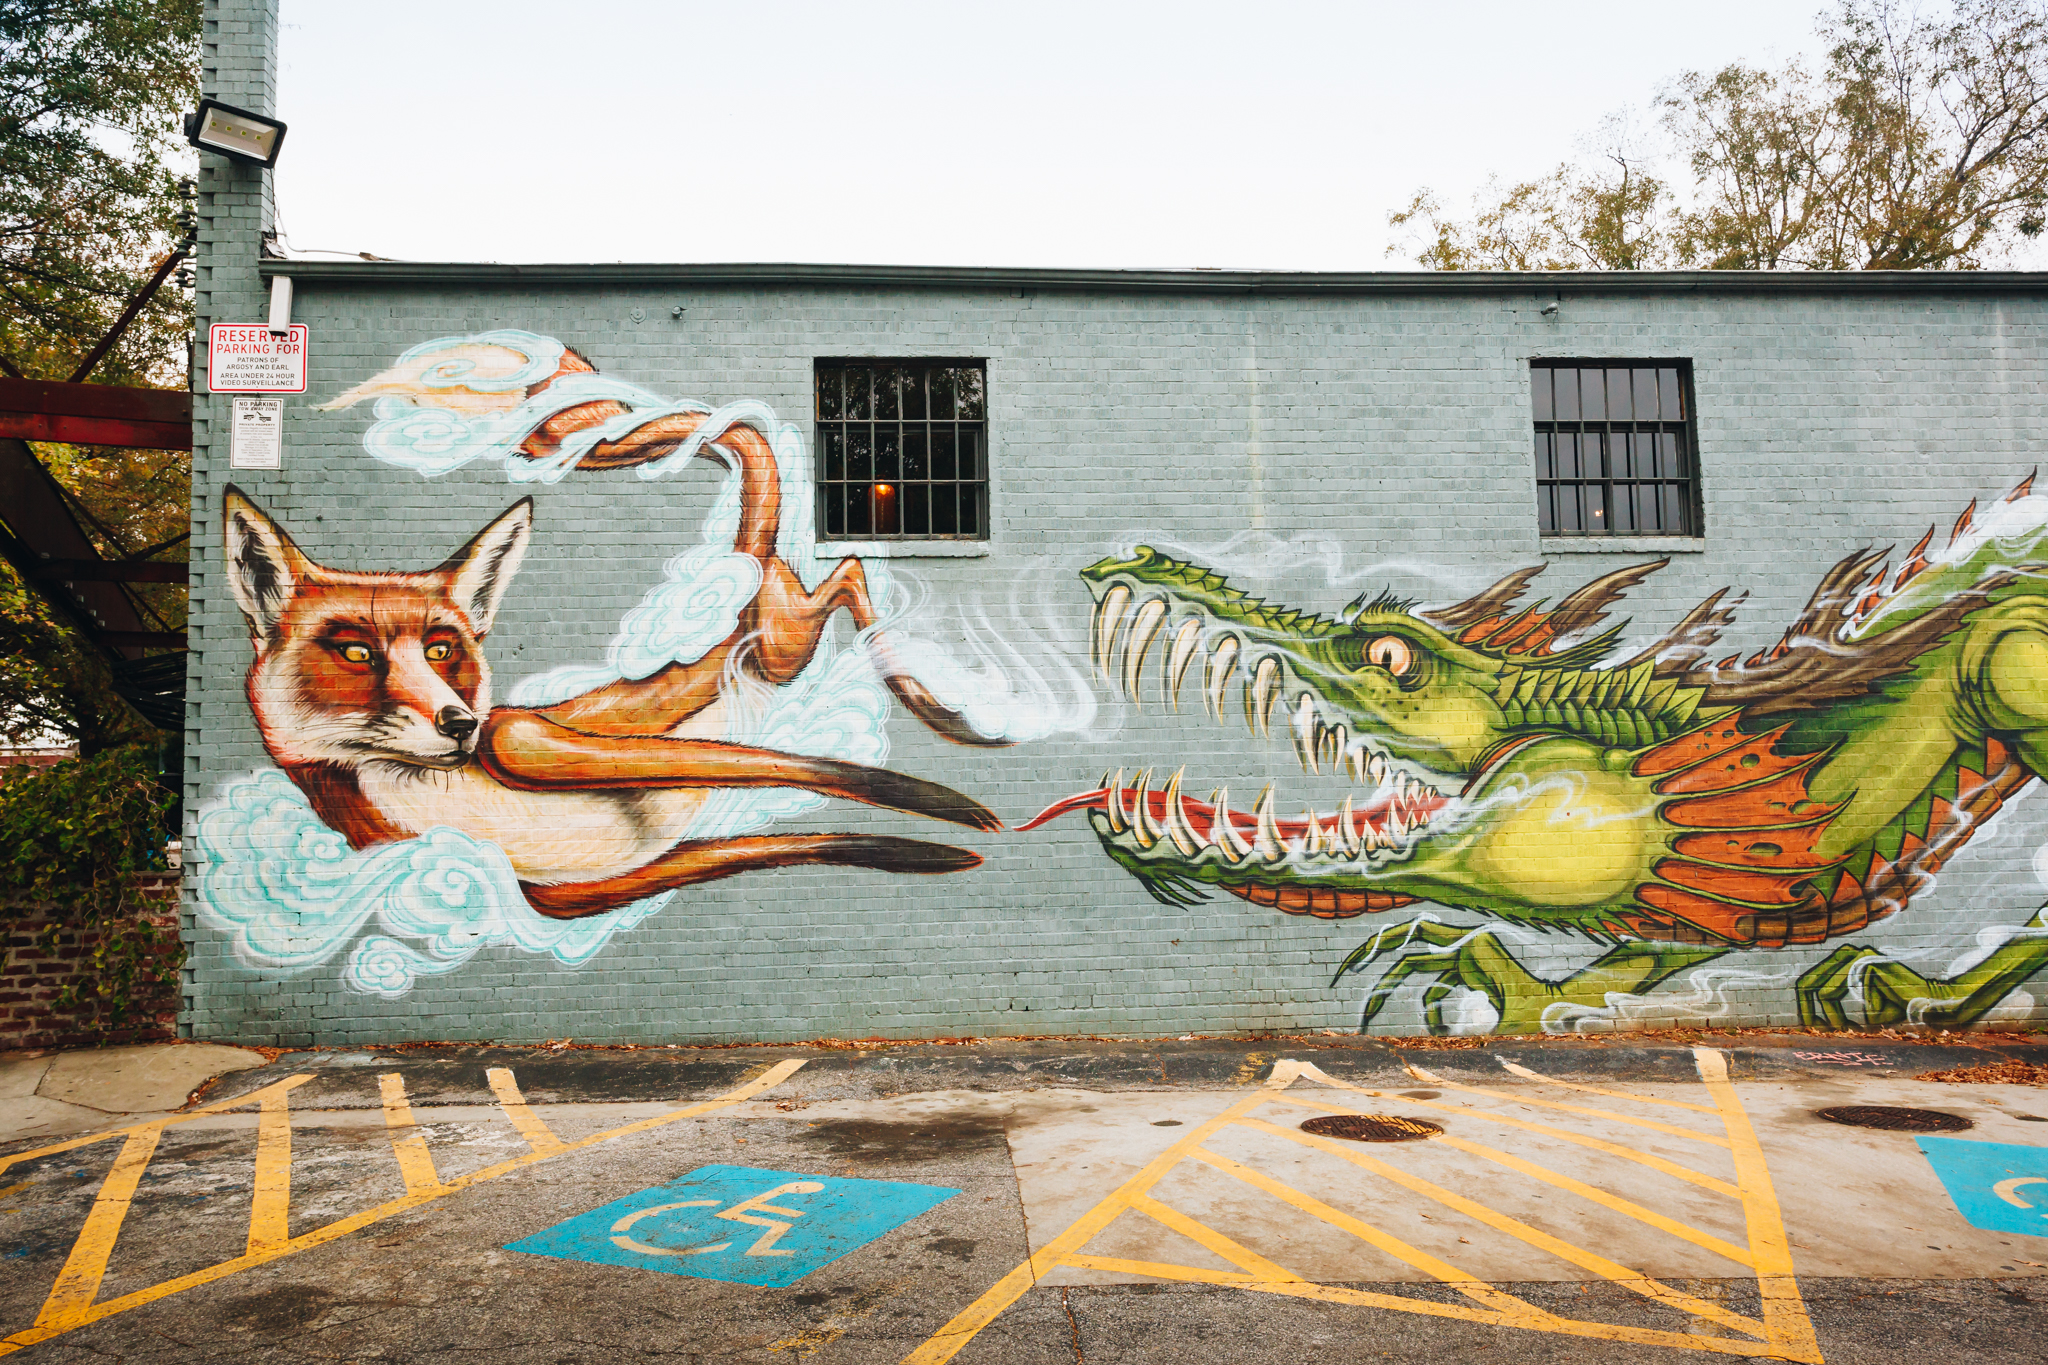 Argosy mural in East Atlanta Village